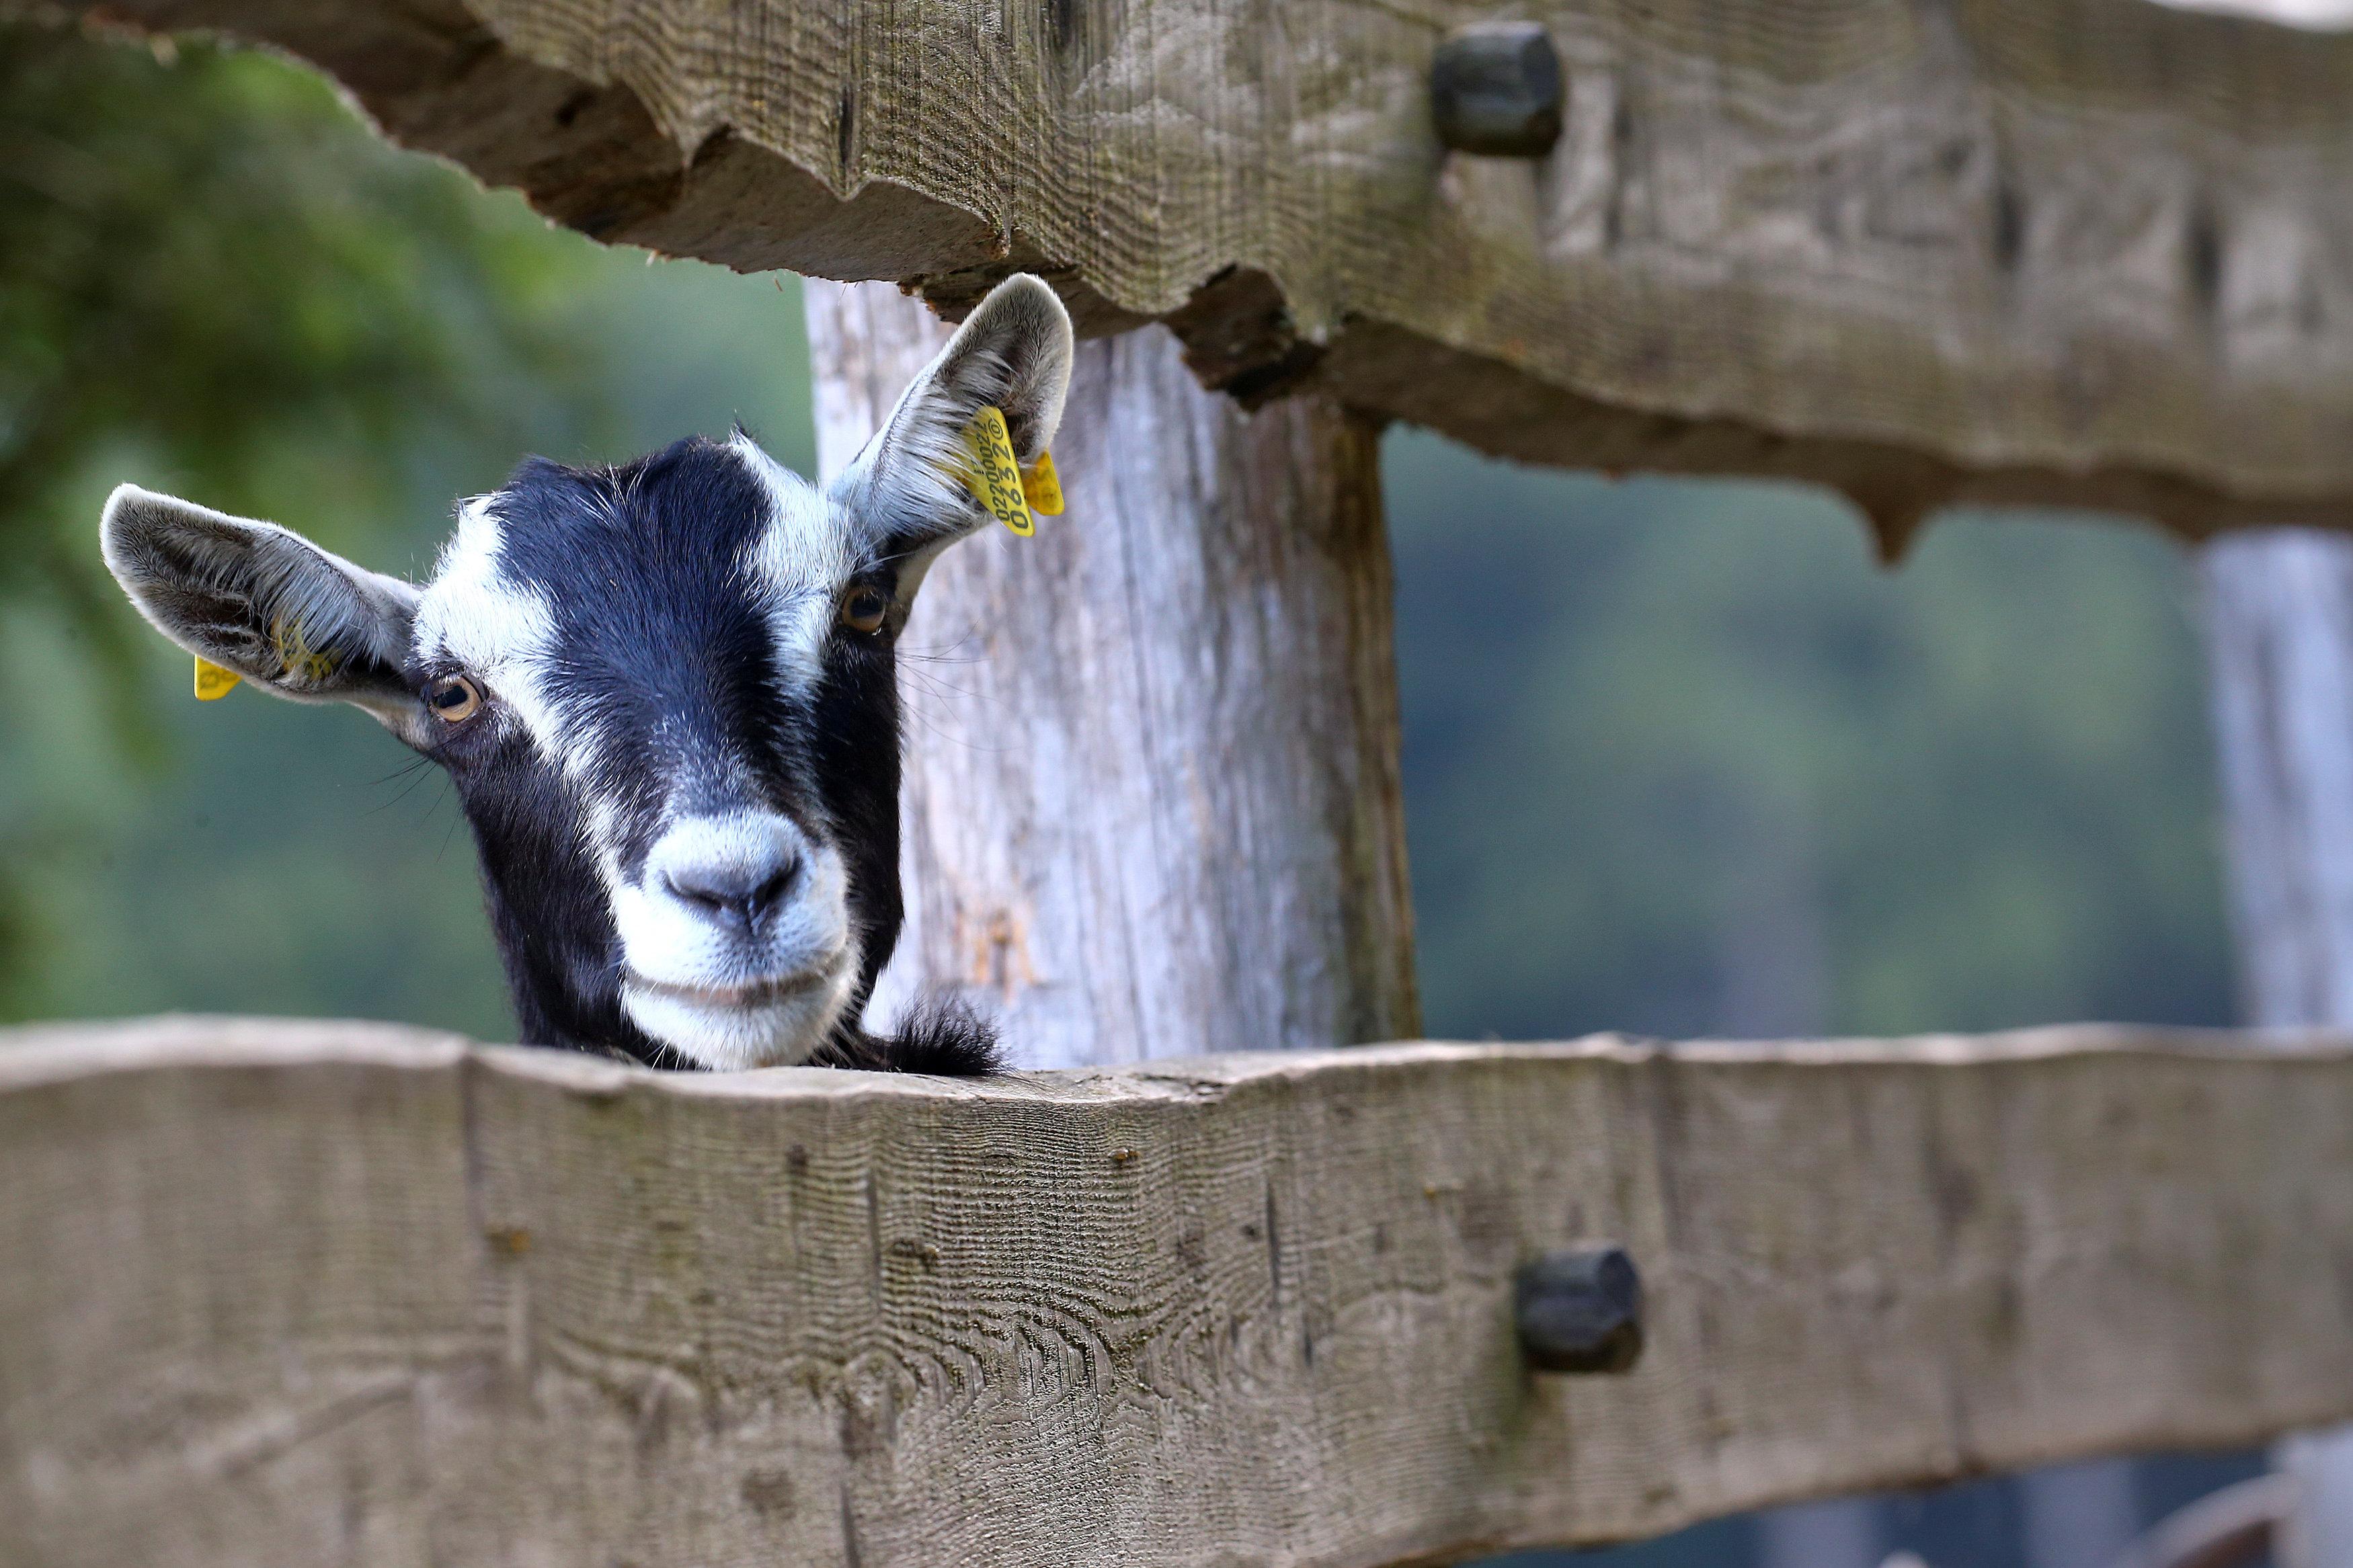 A Mochena goat is seen at the Ethiopian Agitu Idea Gudeta stable in Valle dei Mocheni near Trento